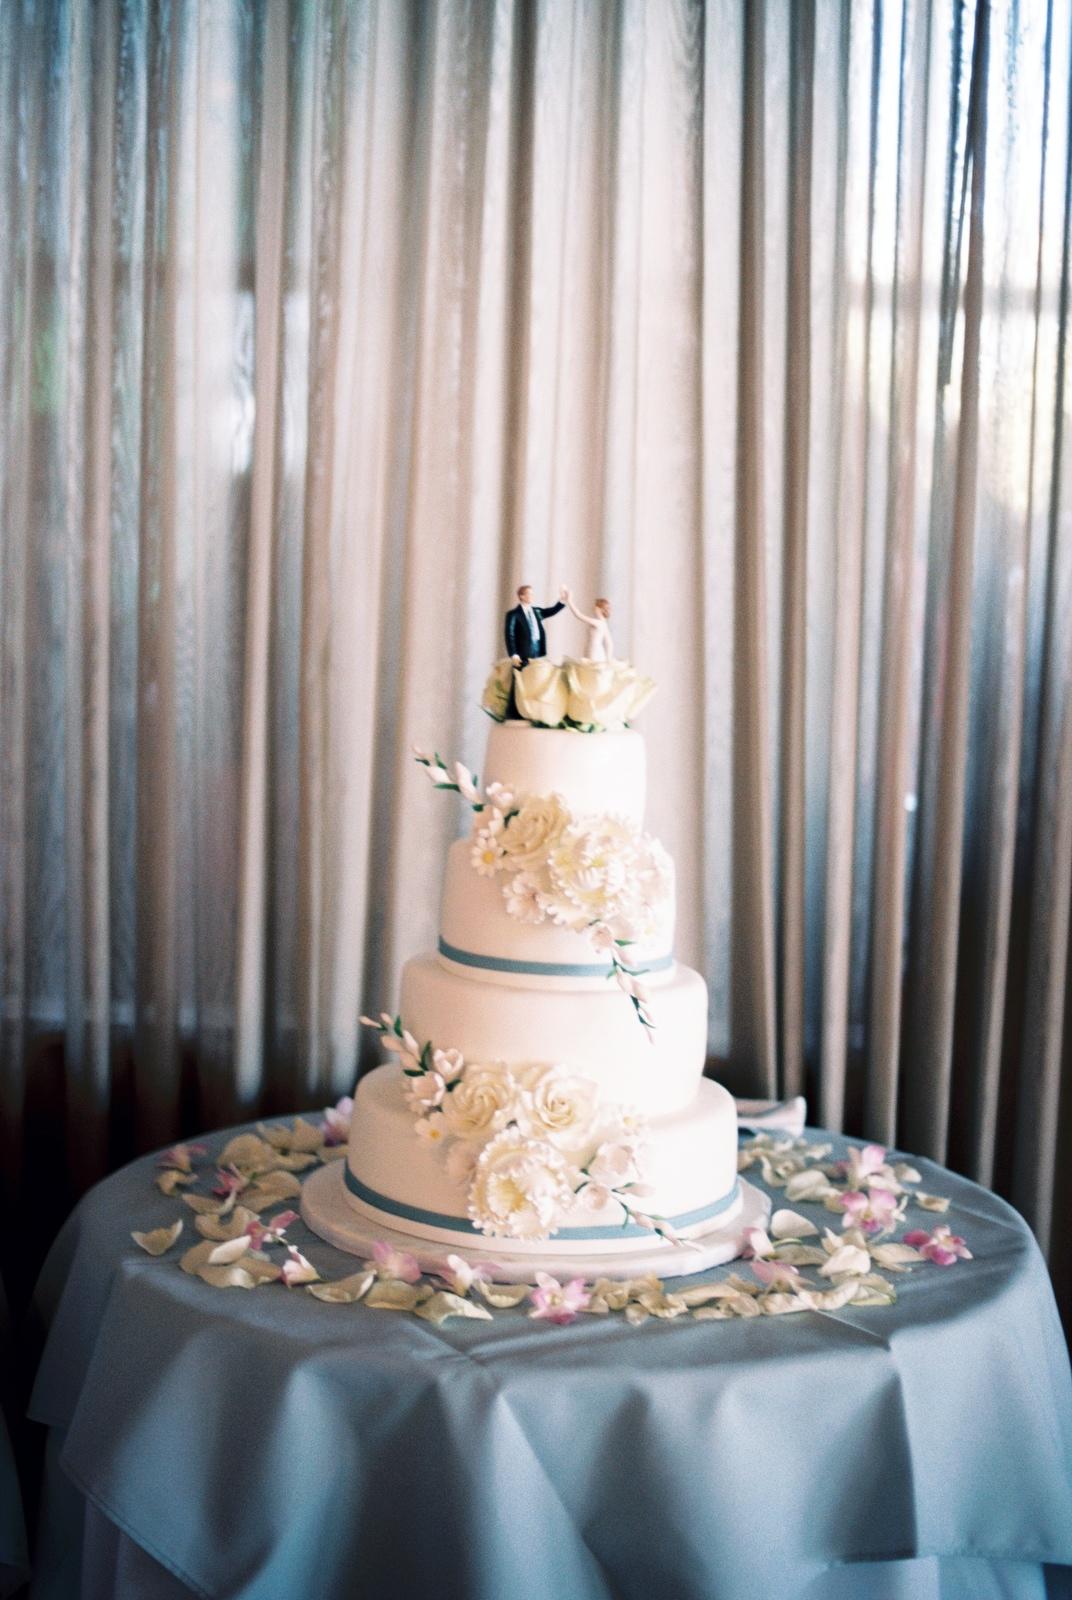 mamaroneck wedding cake shot by wendy g photography